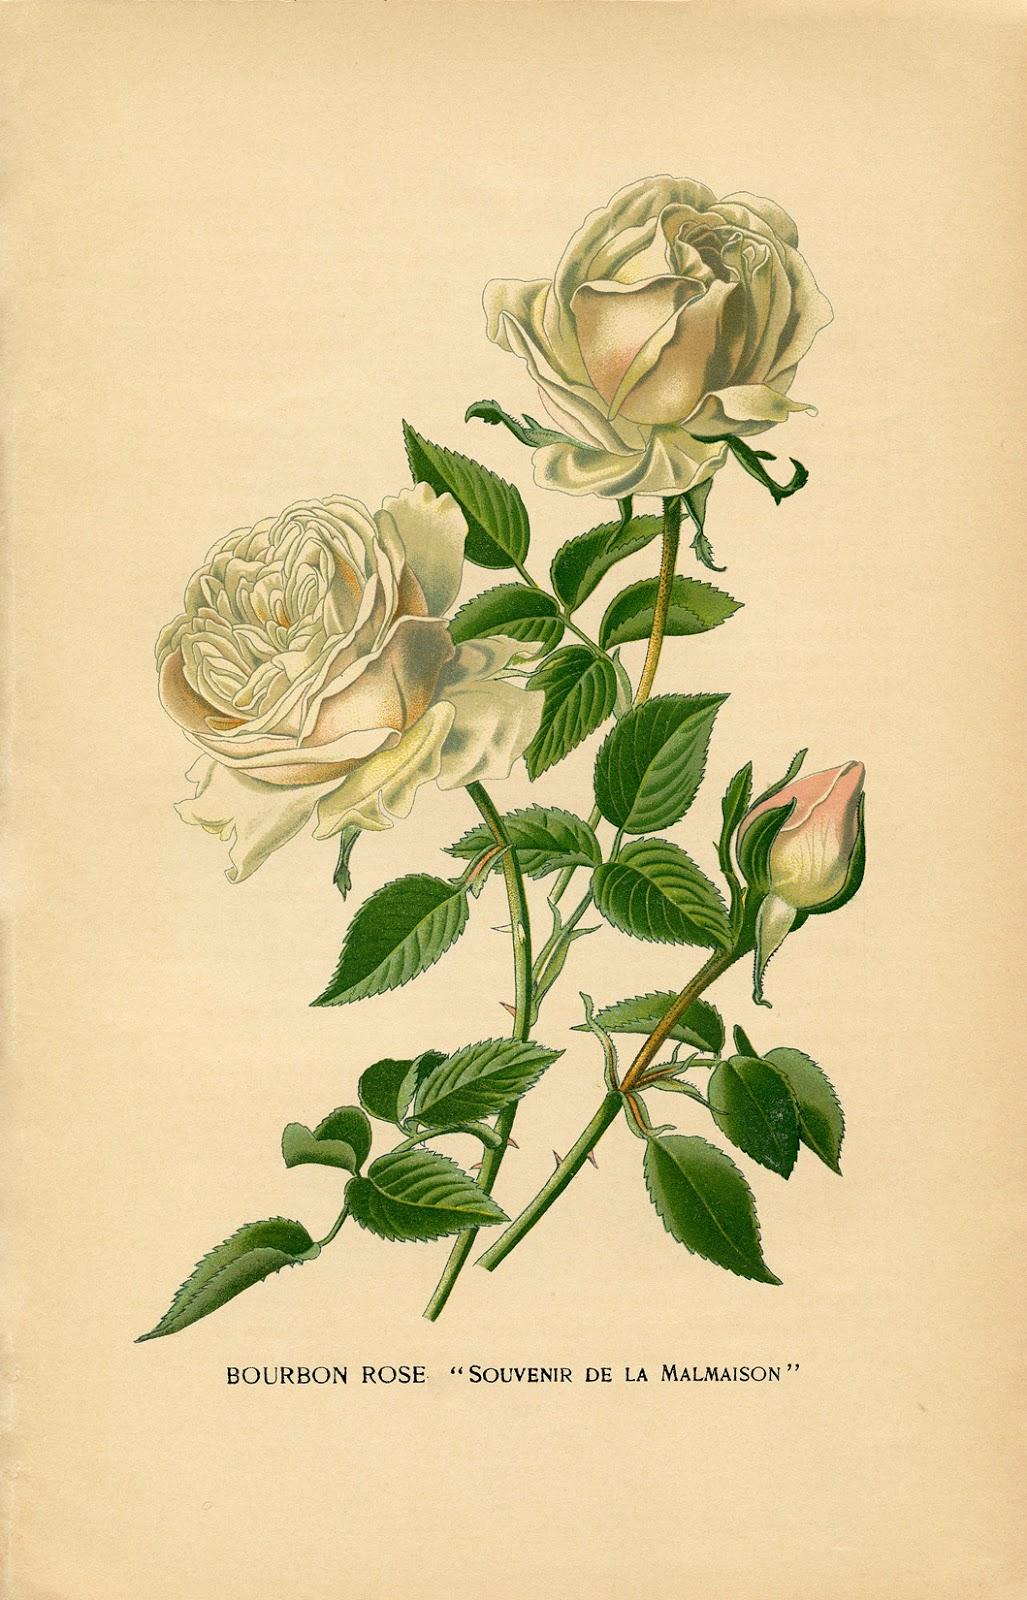 Vintage Printable - White Roses - Botanical - The Graphics ...